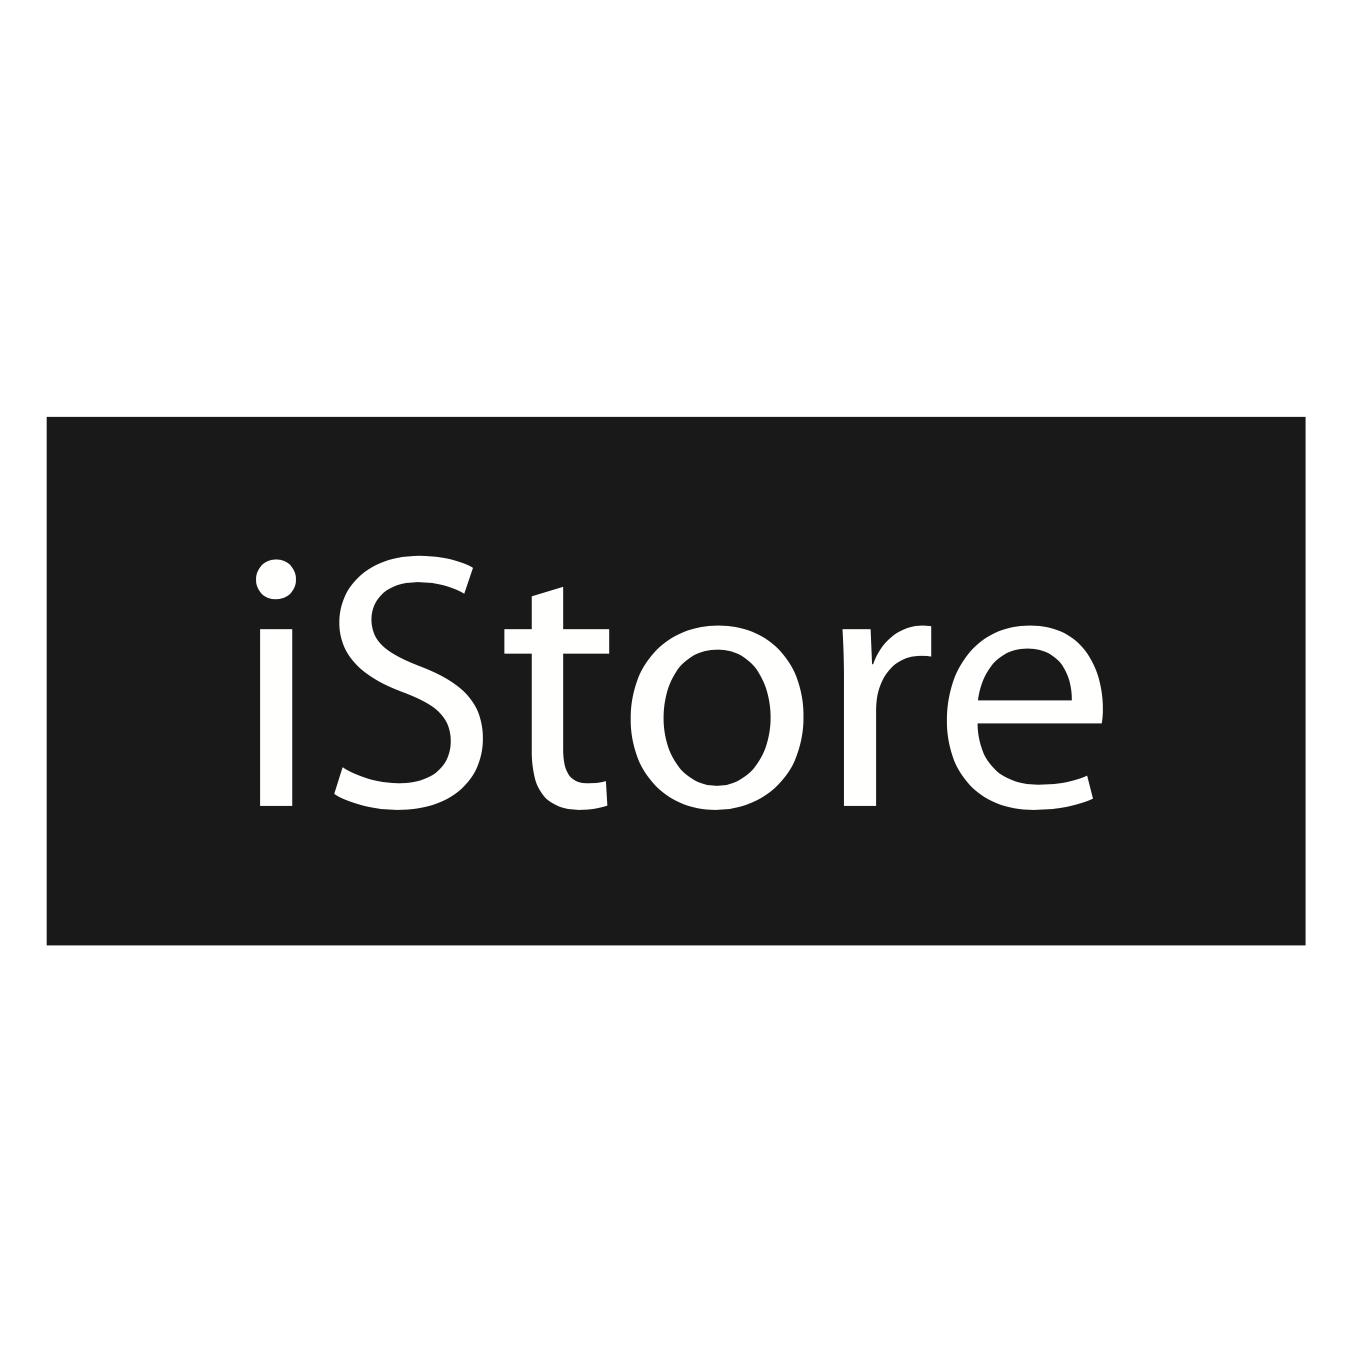 iPhone SE 128GB - White